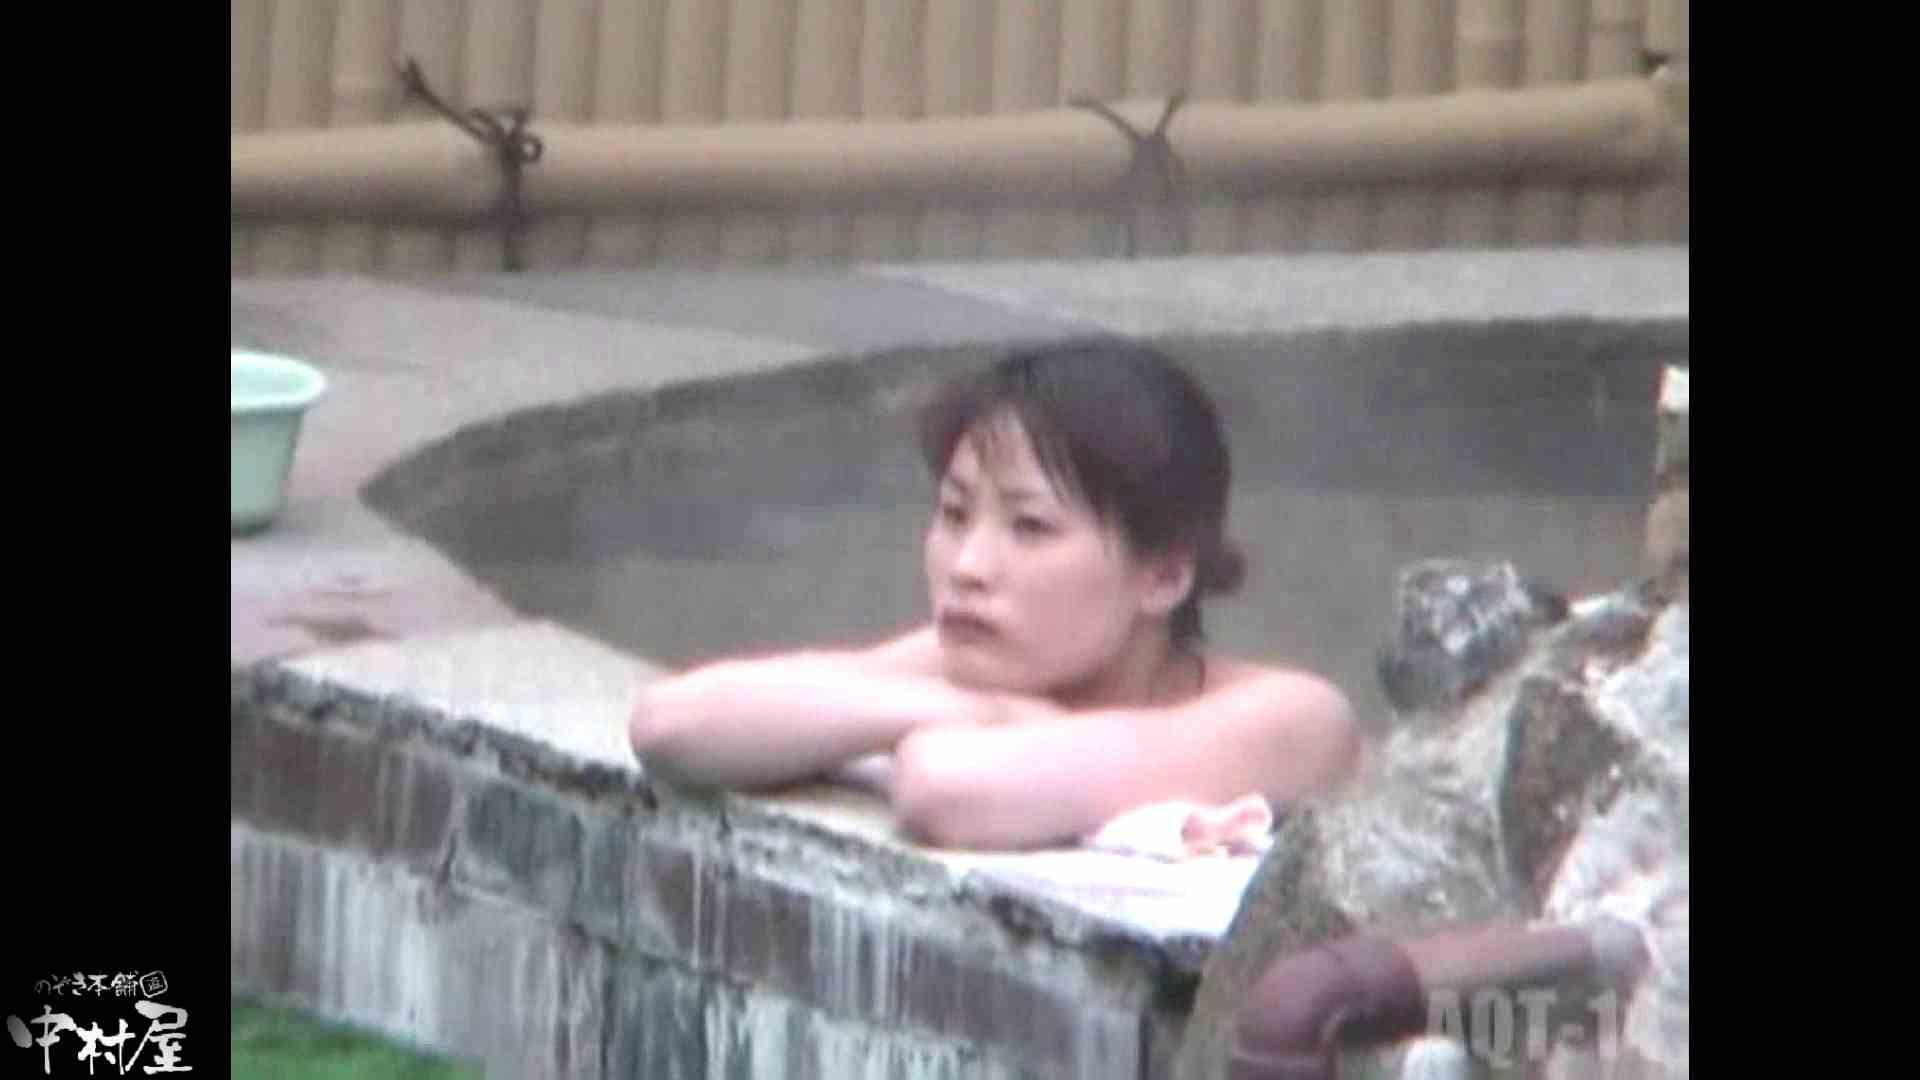 Aquaな露天風呂Vol.878潜入盗撮露天風呂十四判湯 其の三 潜入  48連発 18